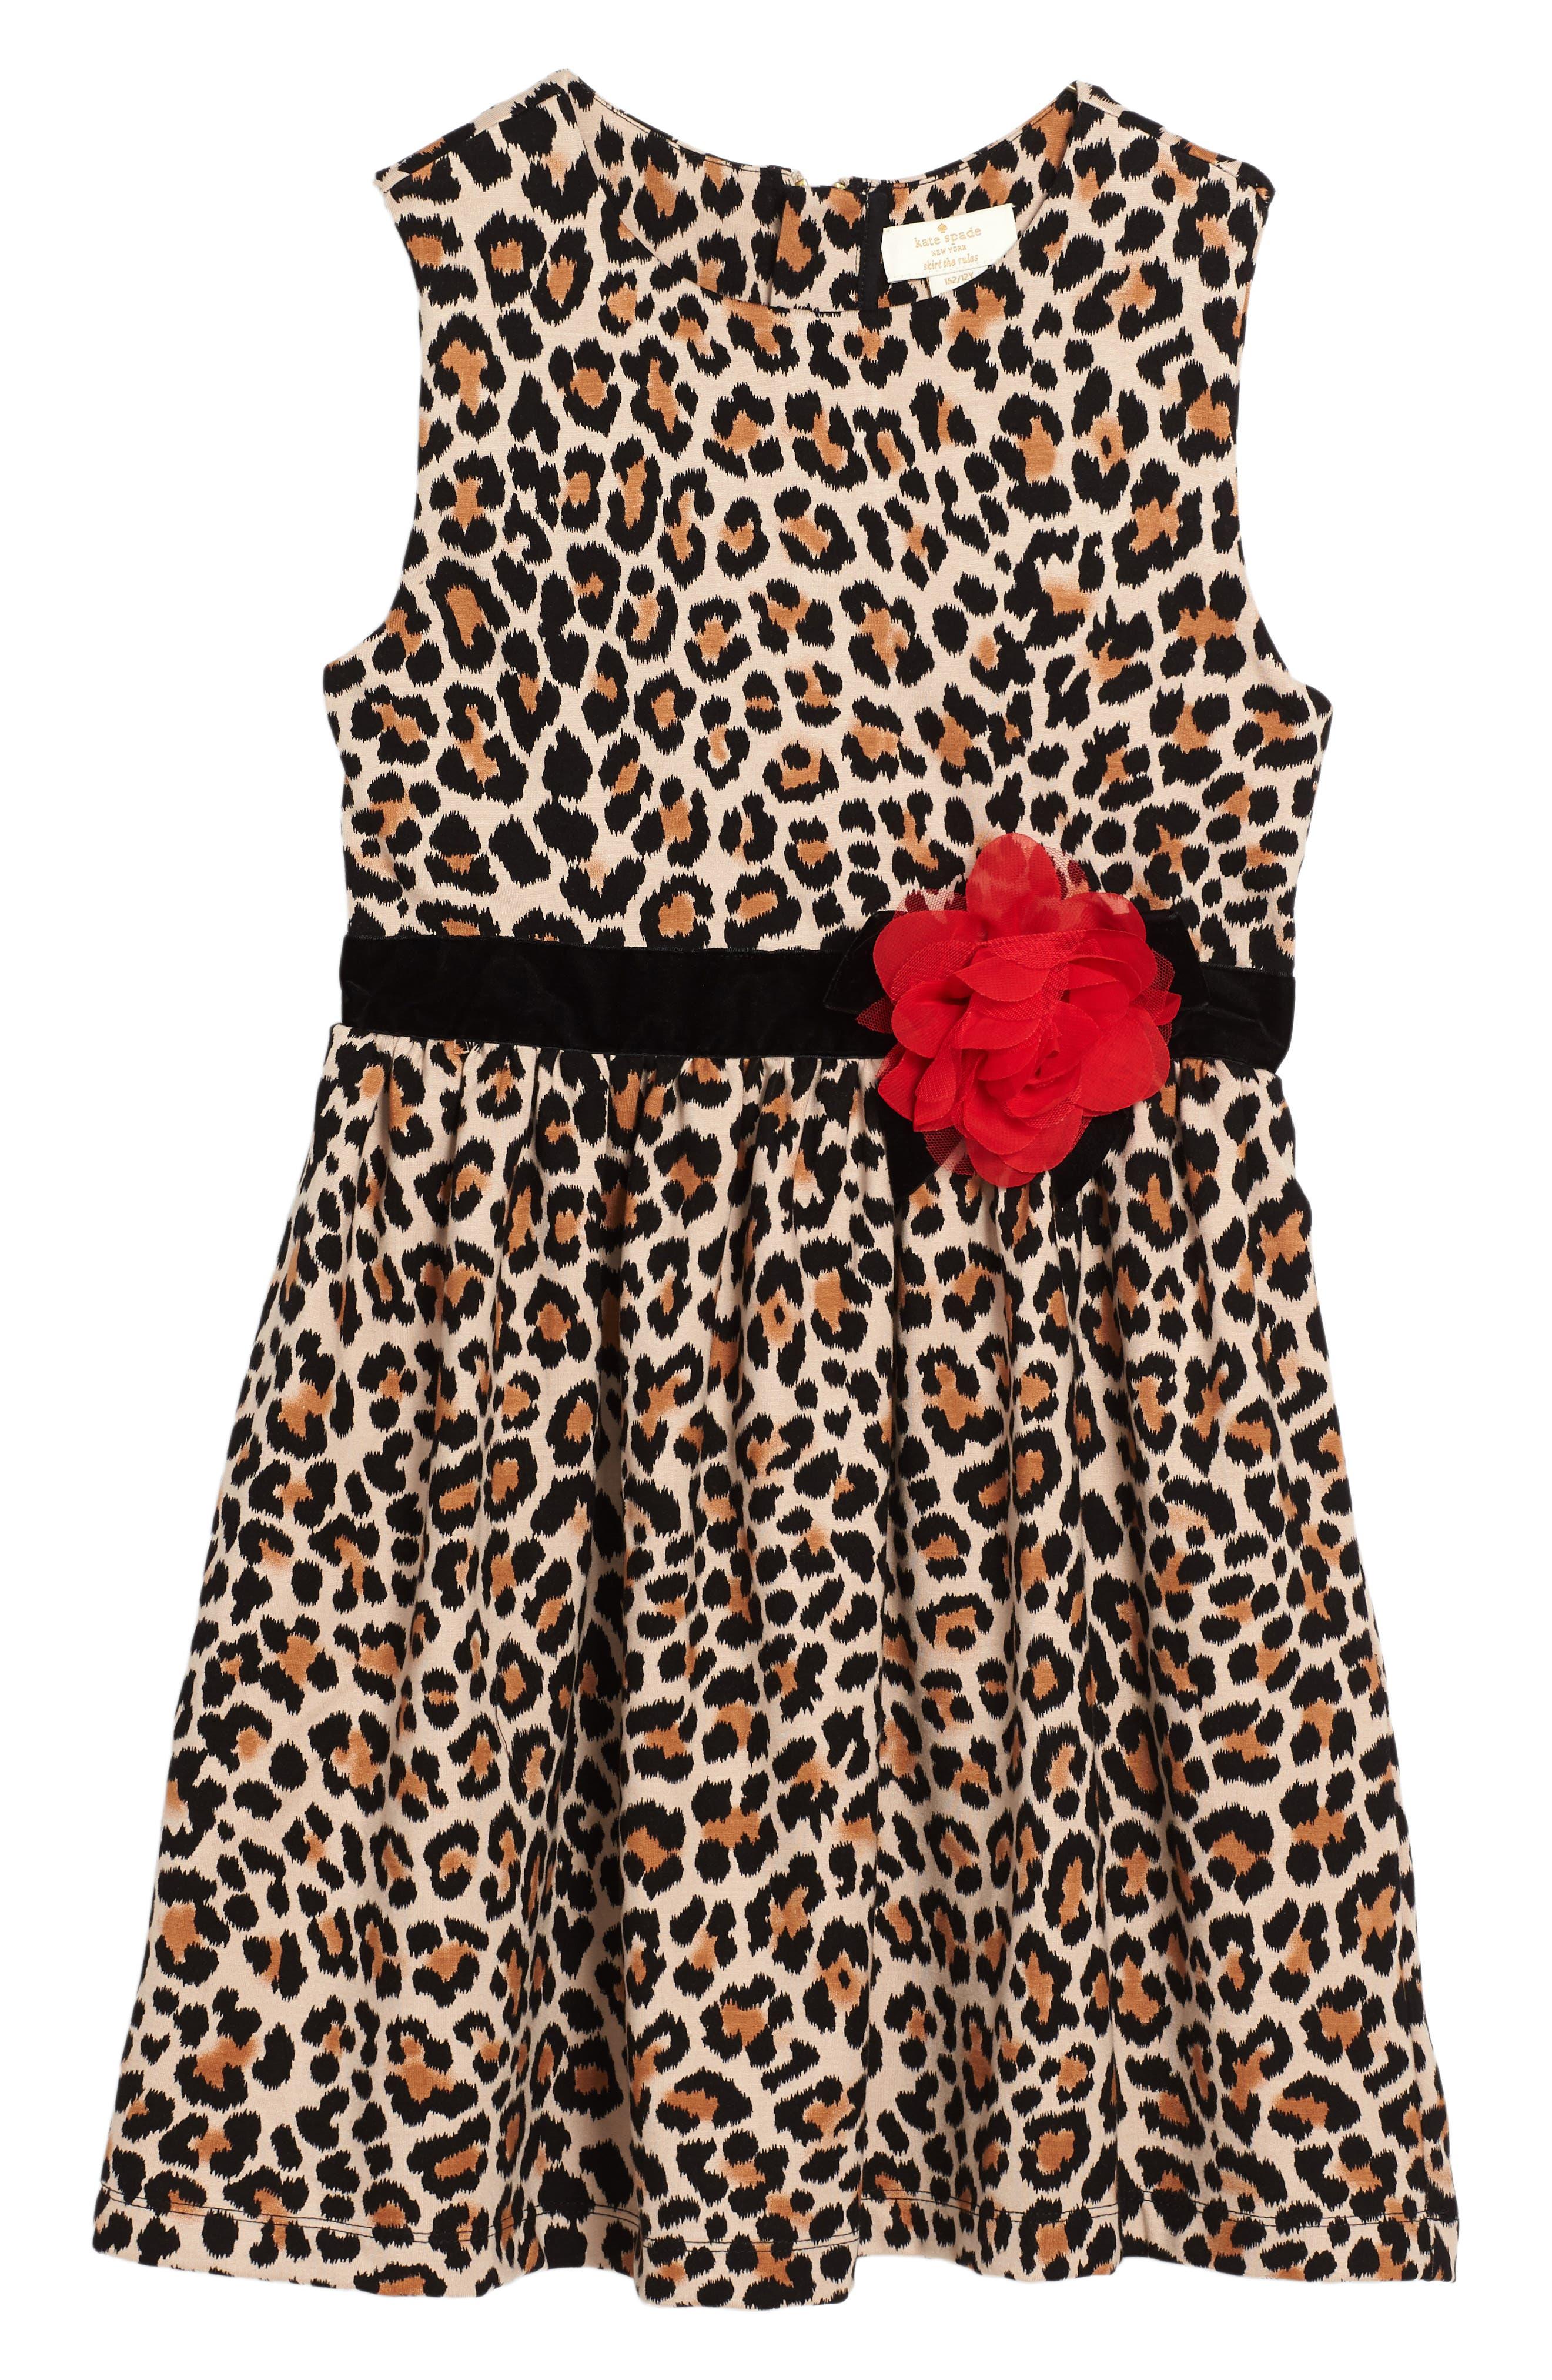 kate spade new york leopard print dress (Big Girls)